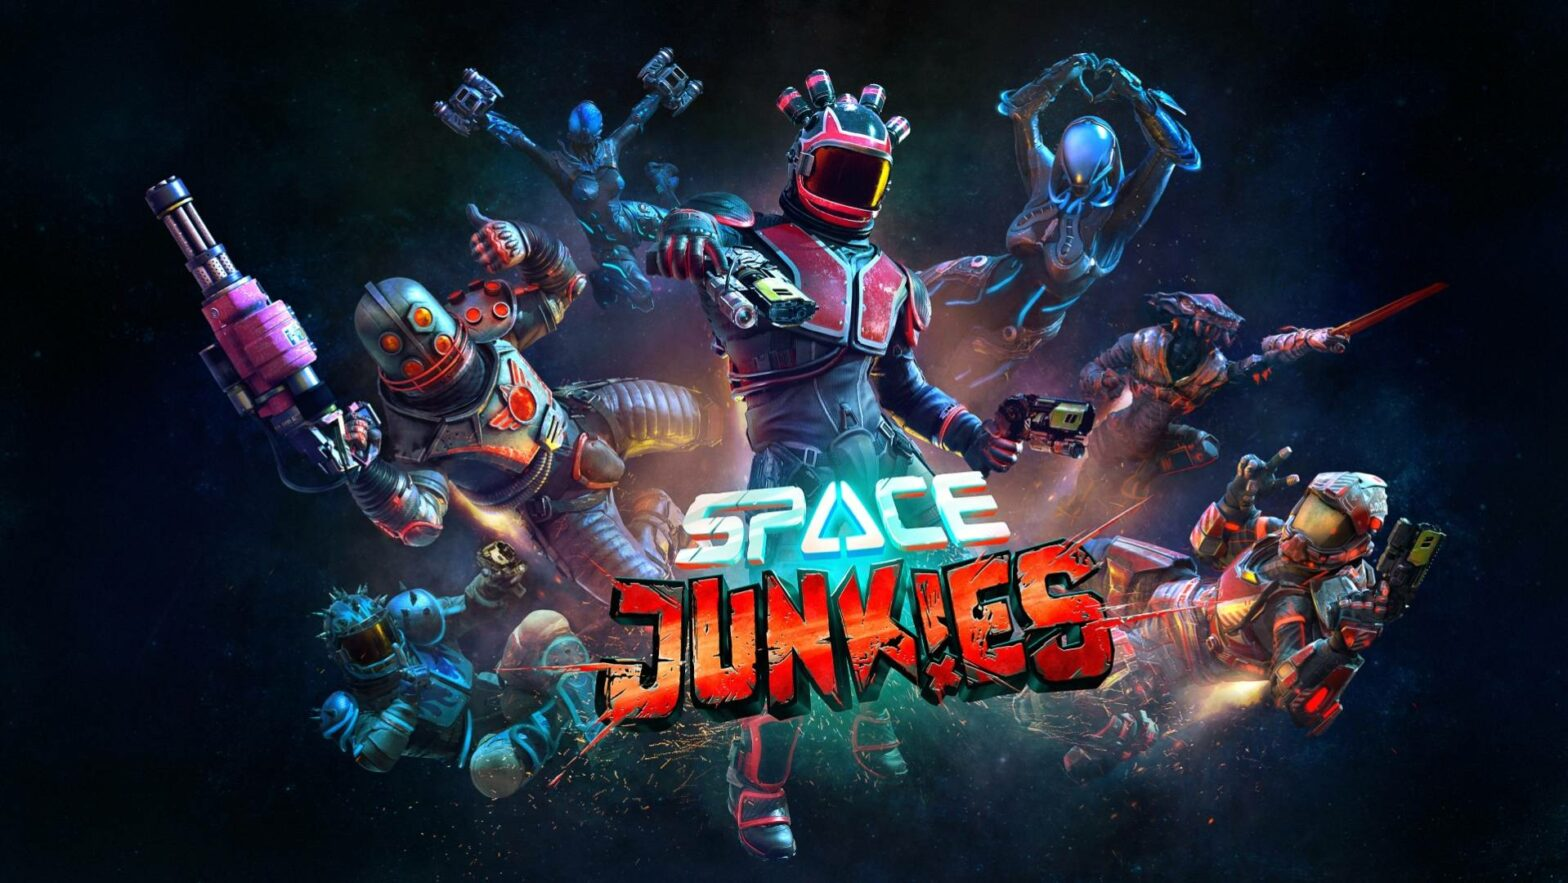 Space Junkies: Closed Beta startet am 26. September